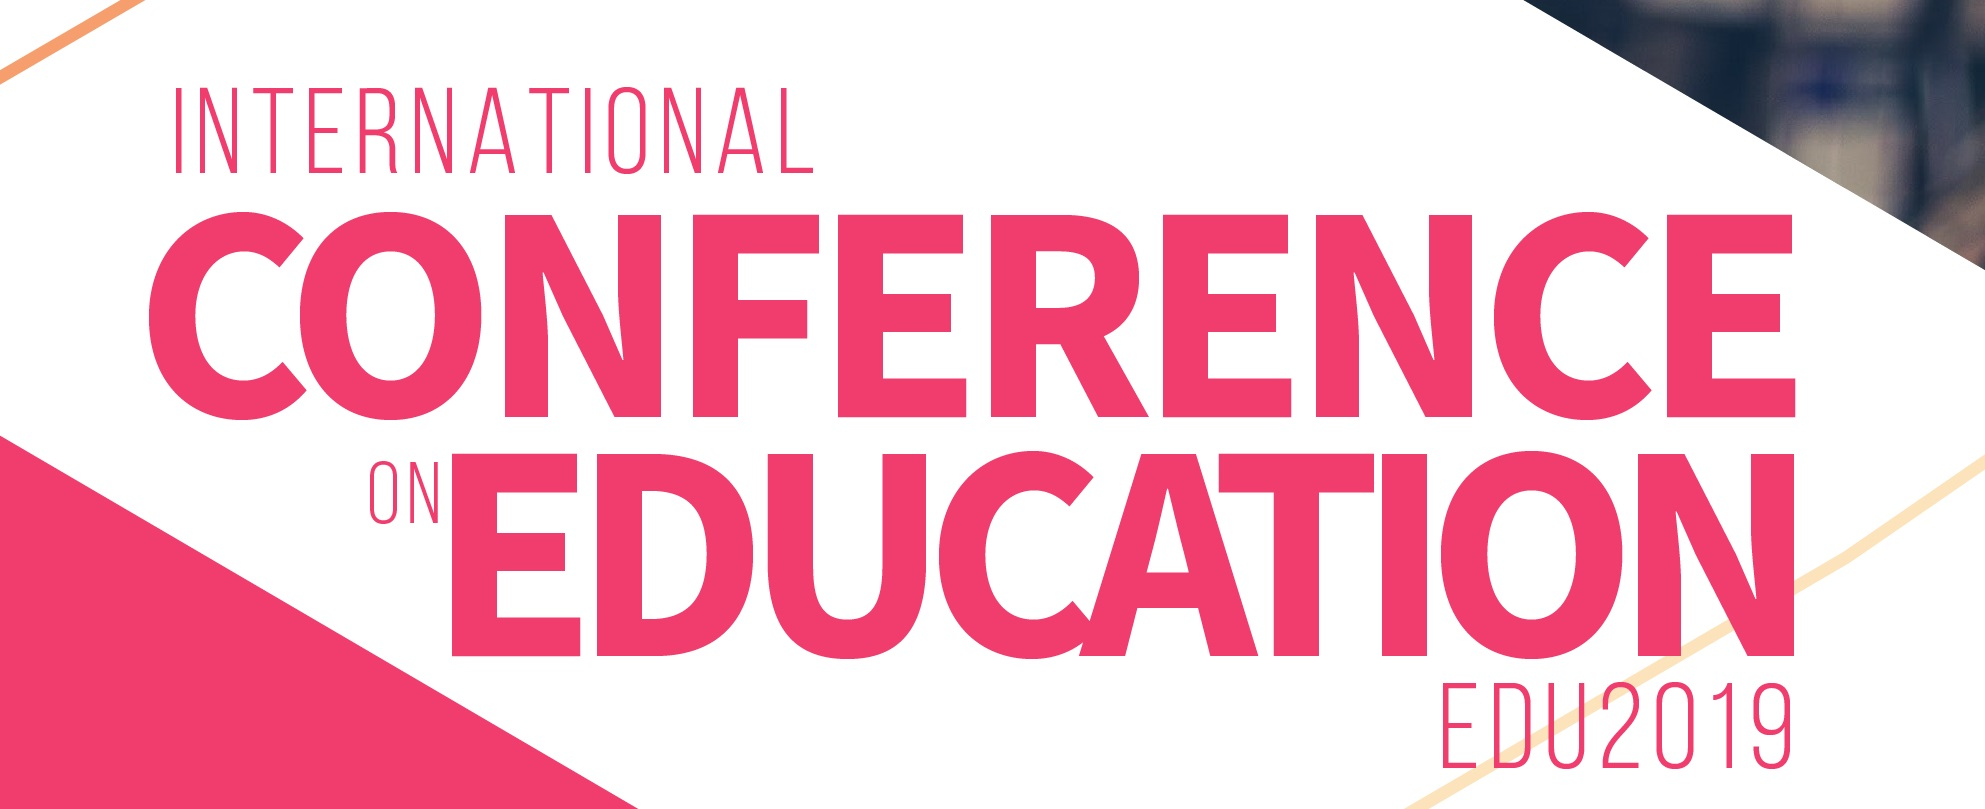 International Conference on Education (EDU2019), Athens, Attica, Greece